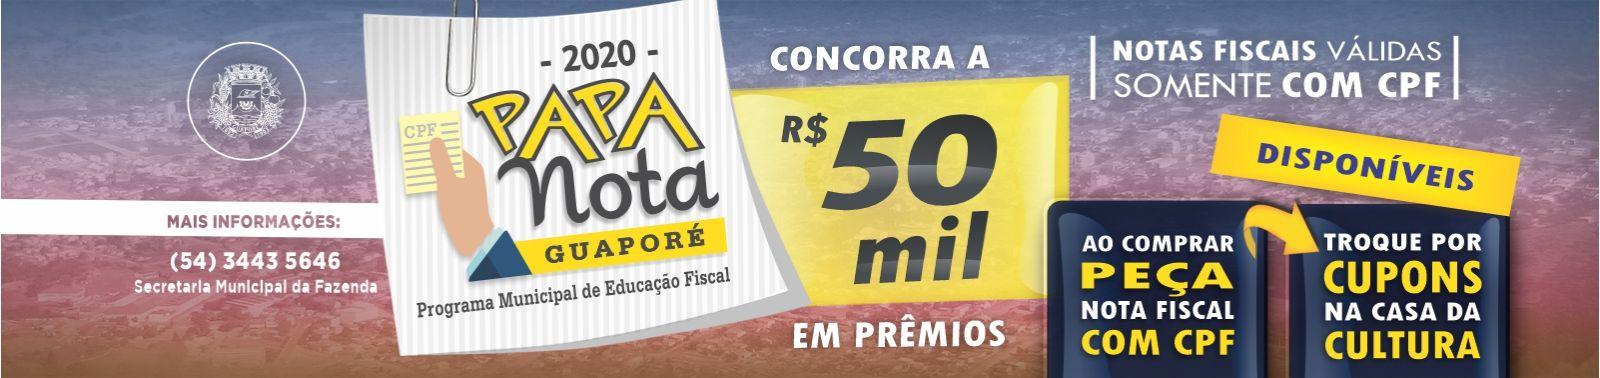 Banner 5 - Papa Nota - CUPONS DISPONÍVEIS